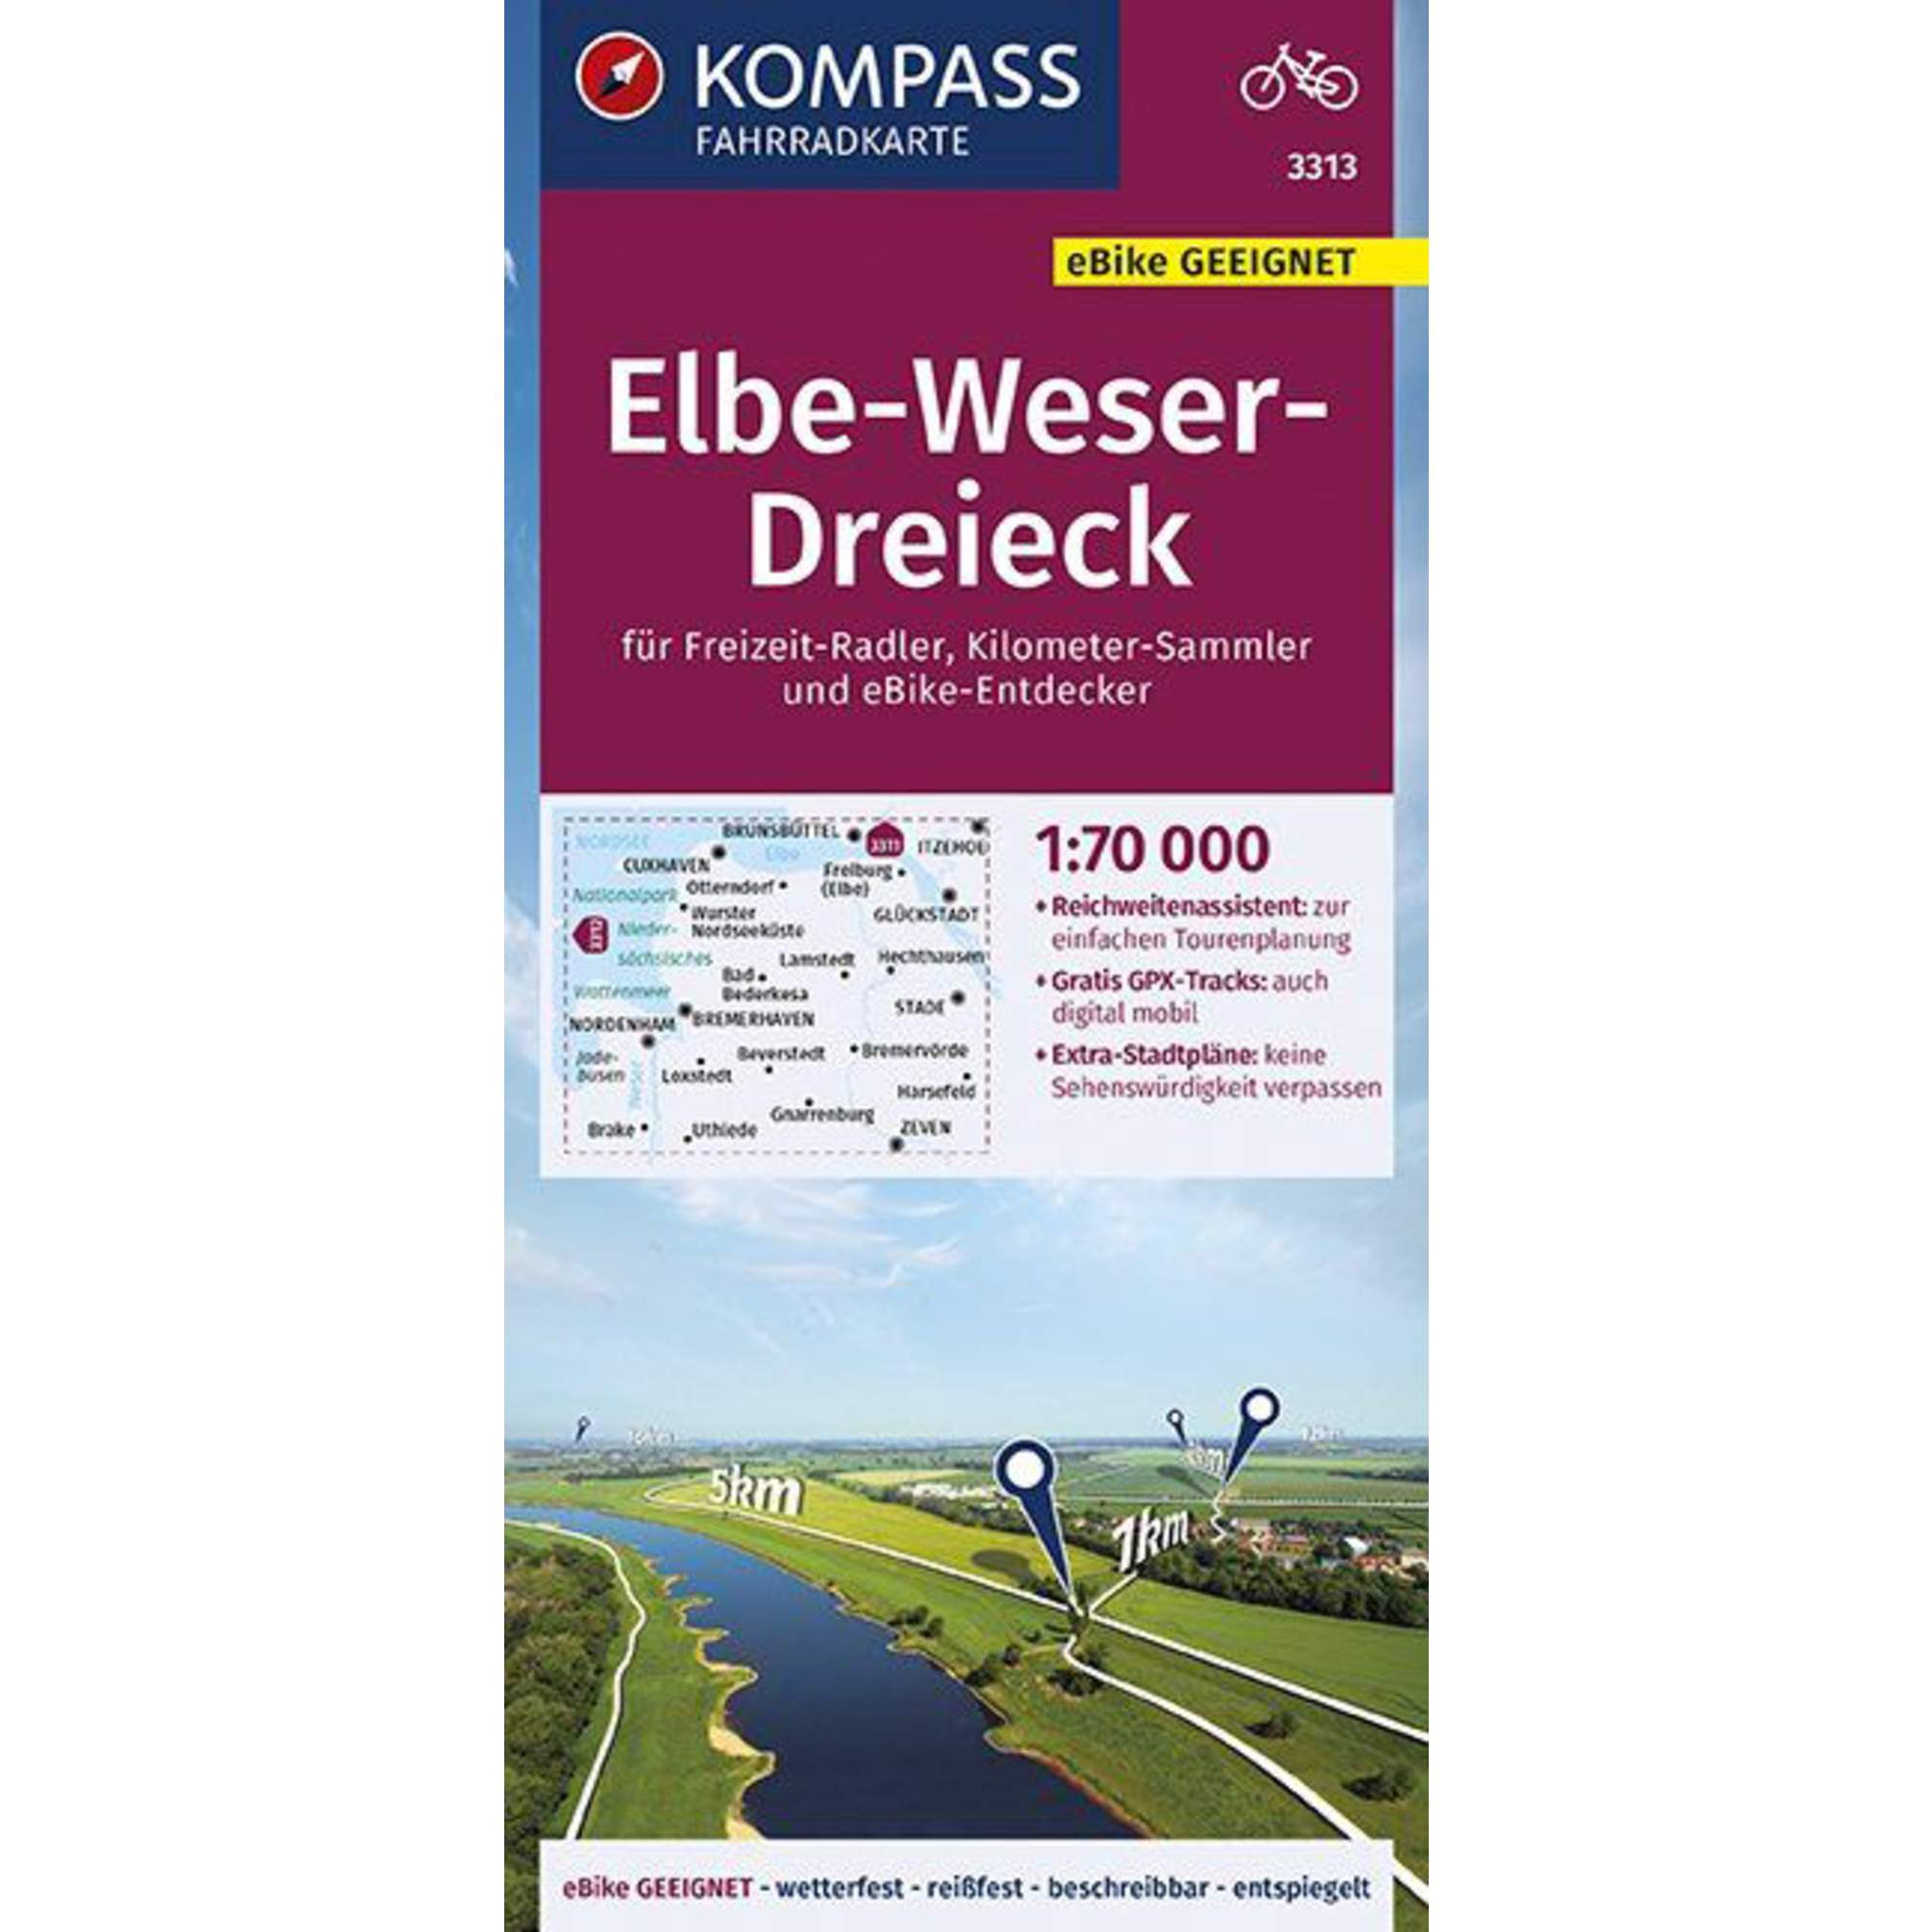 KOMPASS FAHRRADKARTE ELBE-WESER-DREIECK -  Fahrradkarten